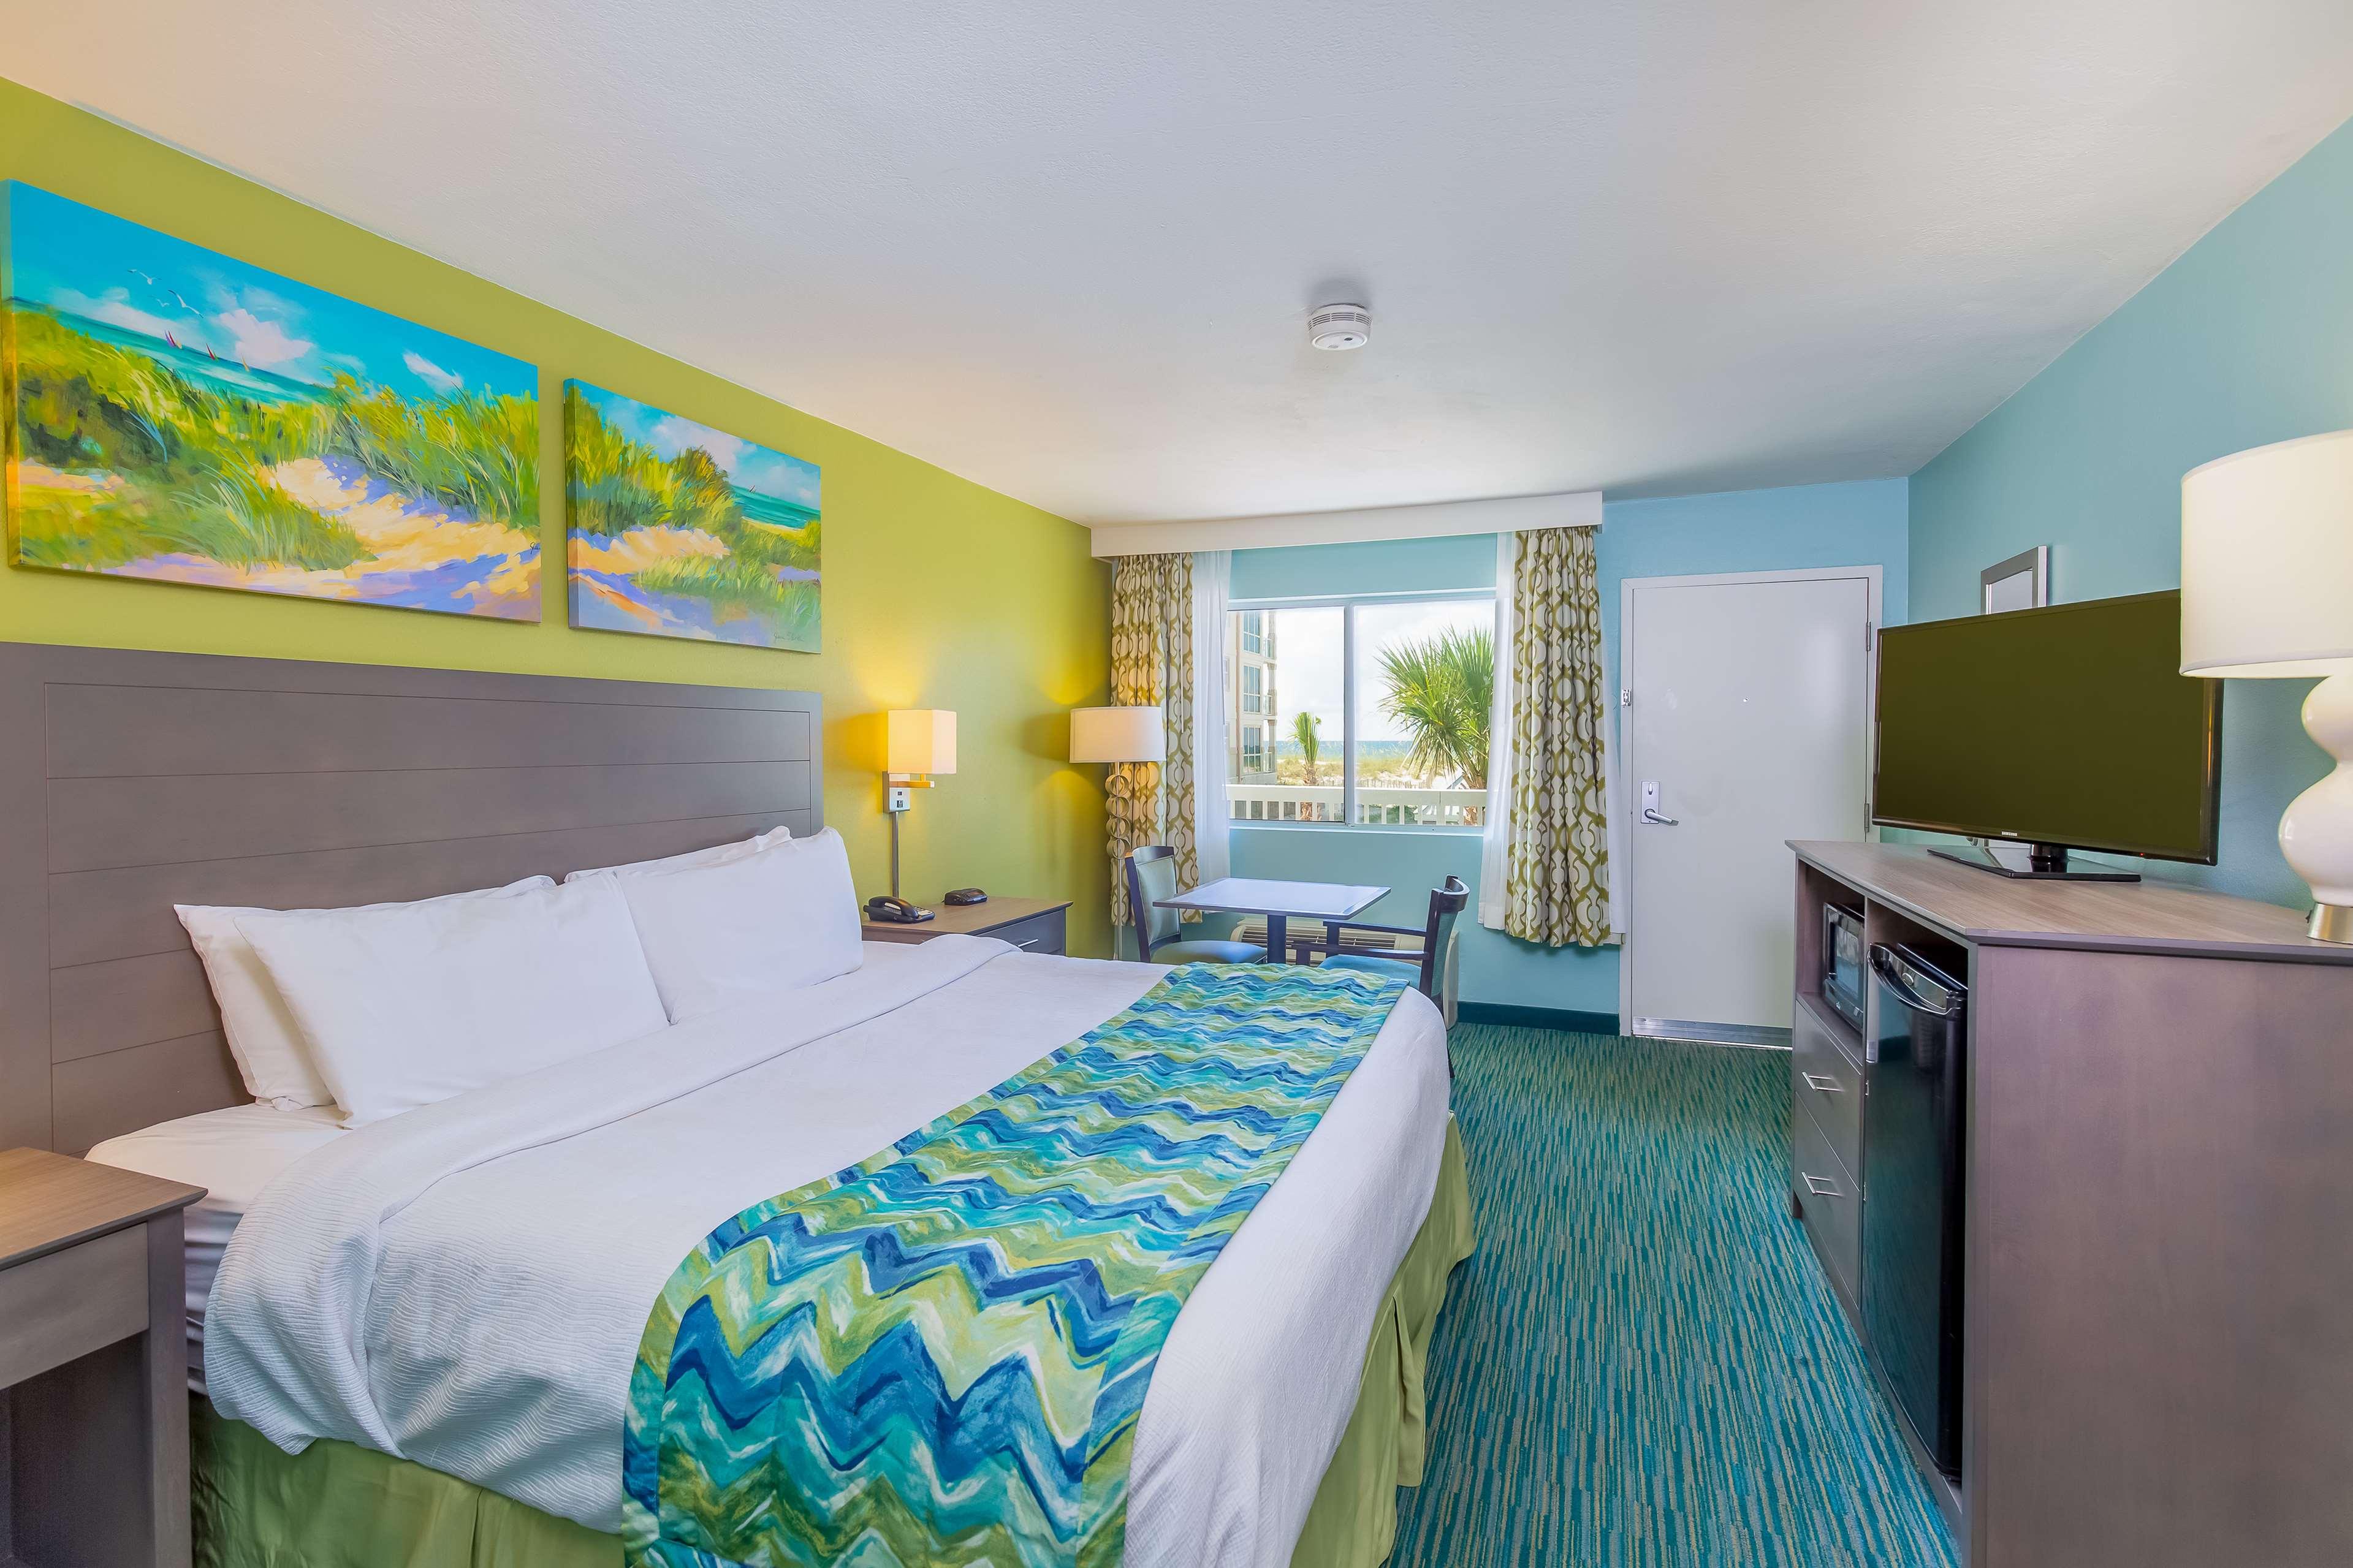 Best Western Beachside Resort image 41